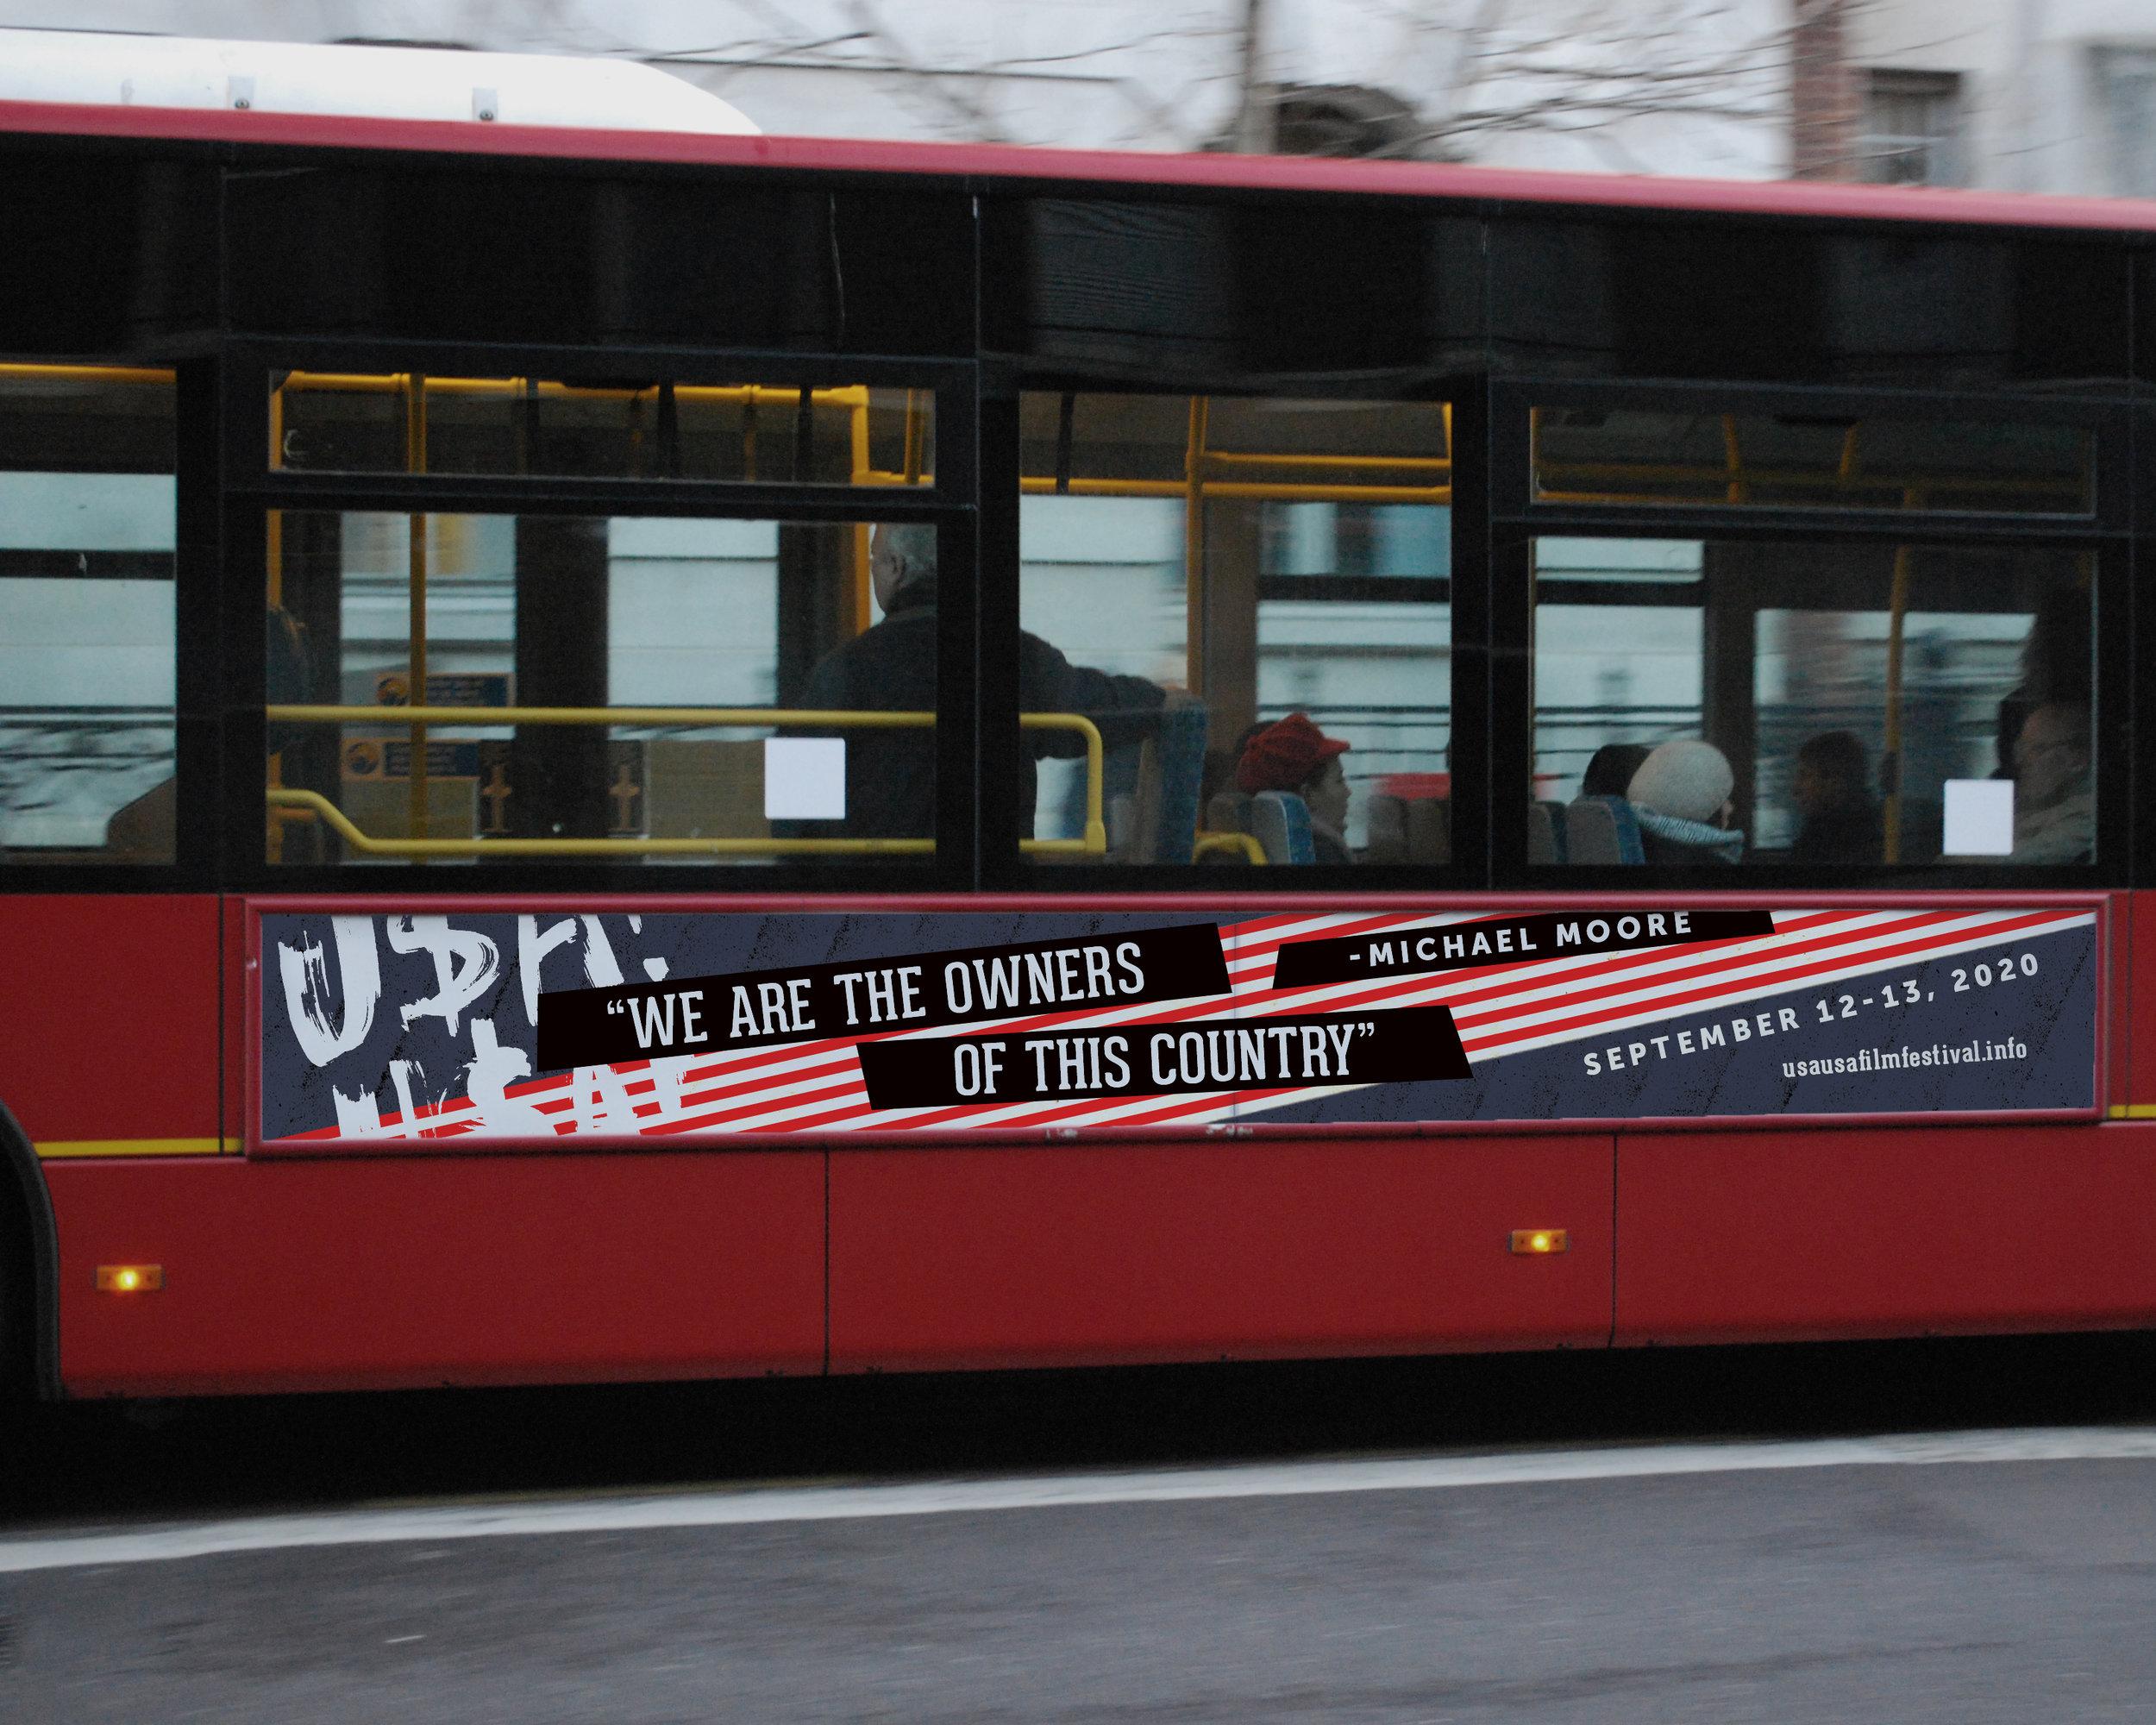 Ad_bus.jpg